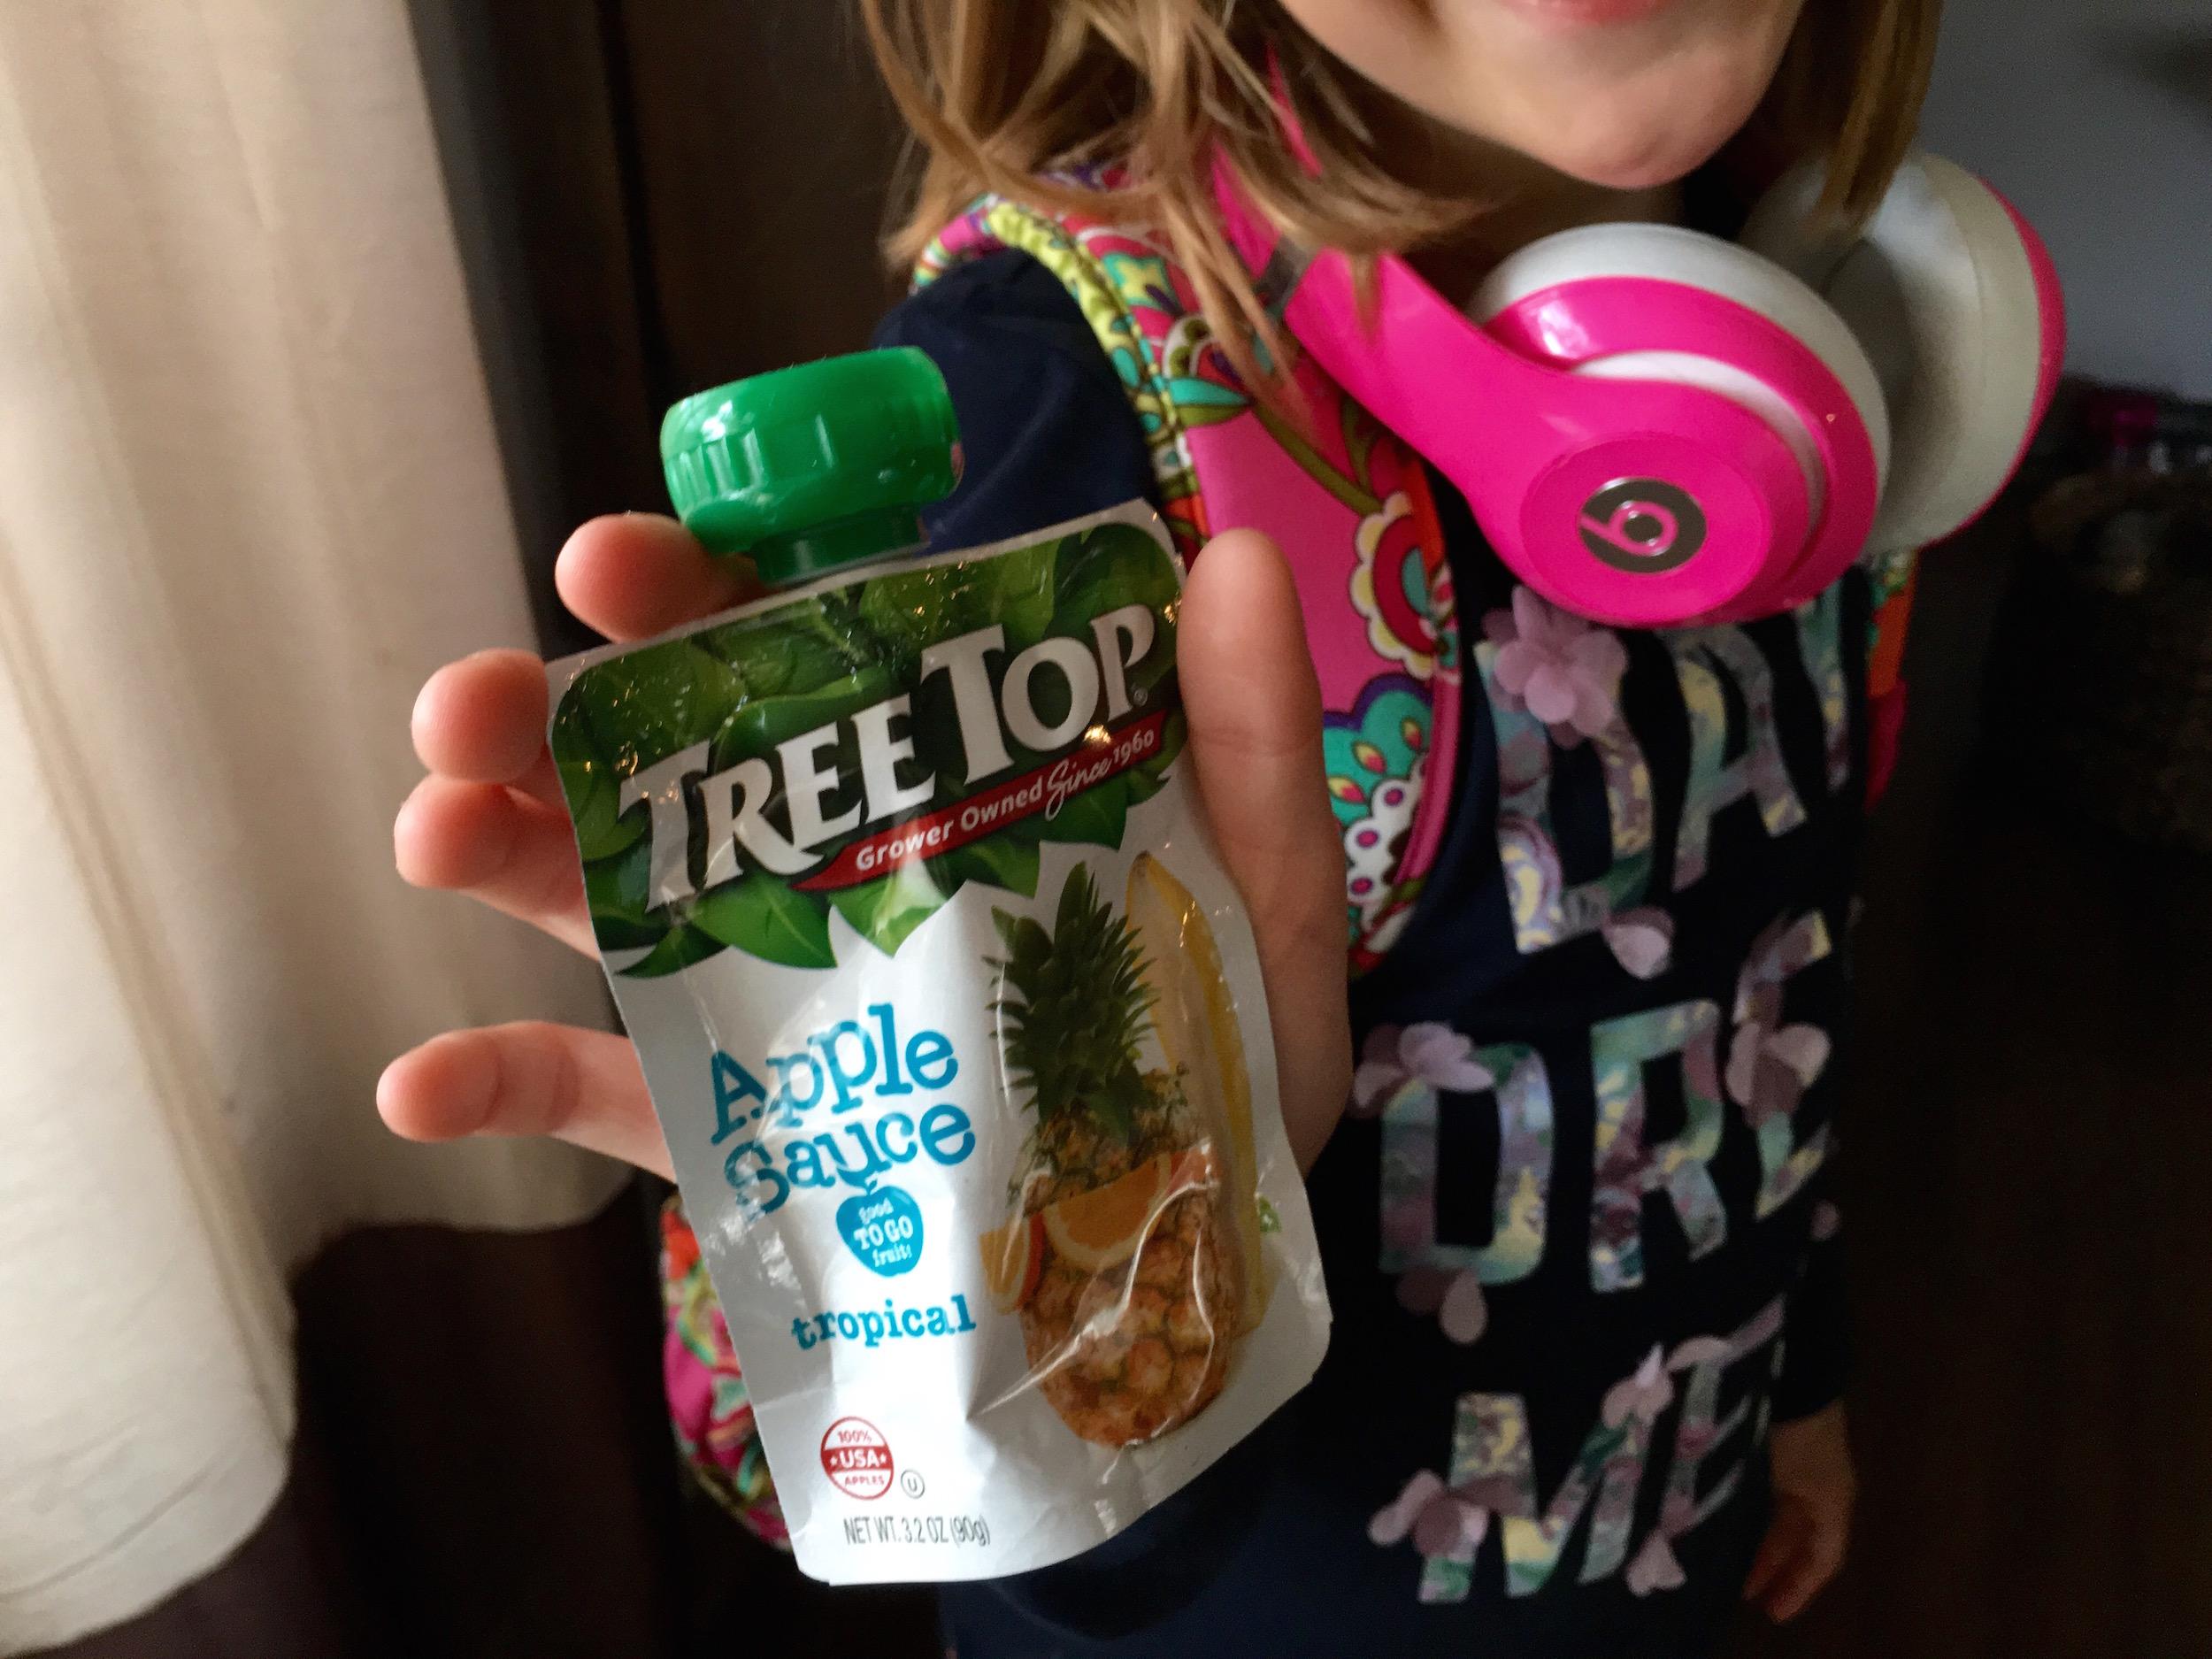 Tree Top #Hanger2Happy | The JetSet Family